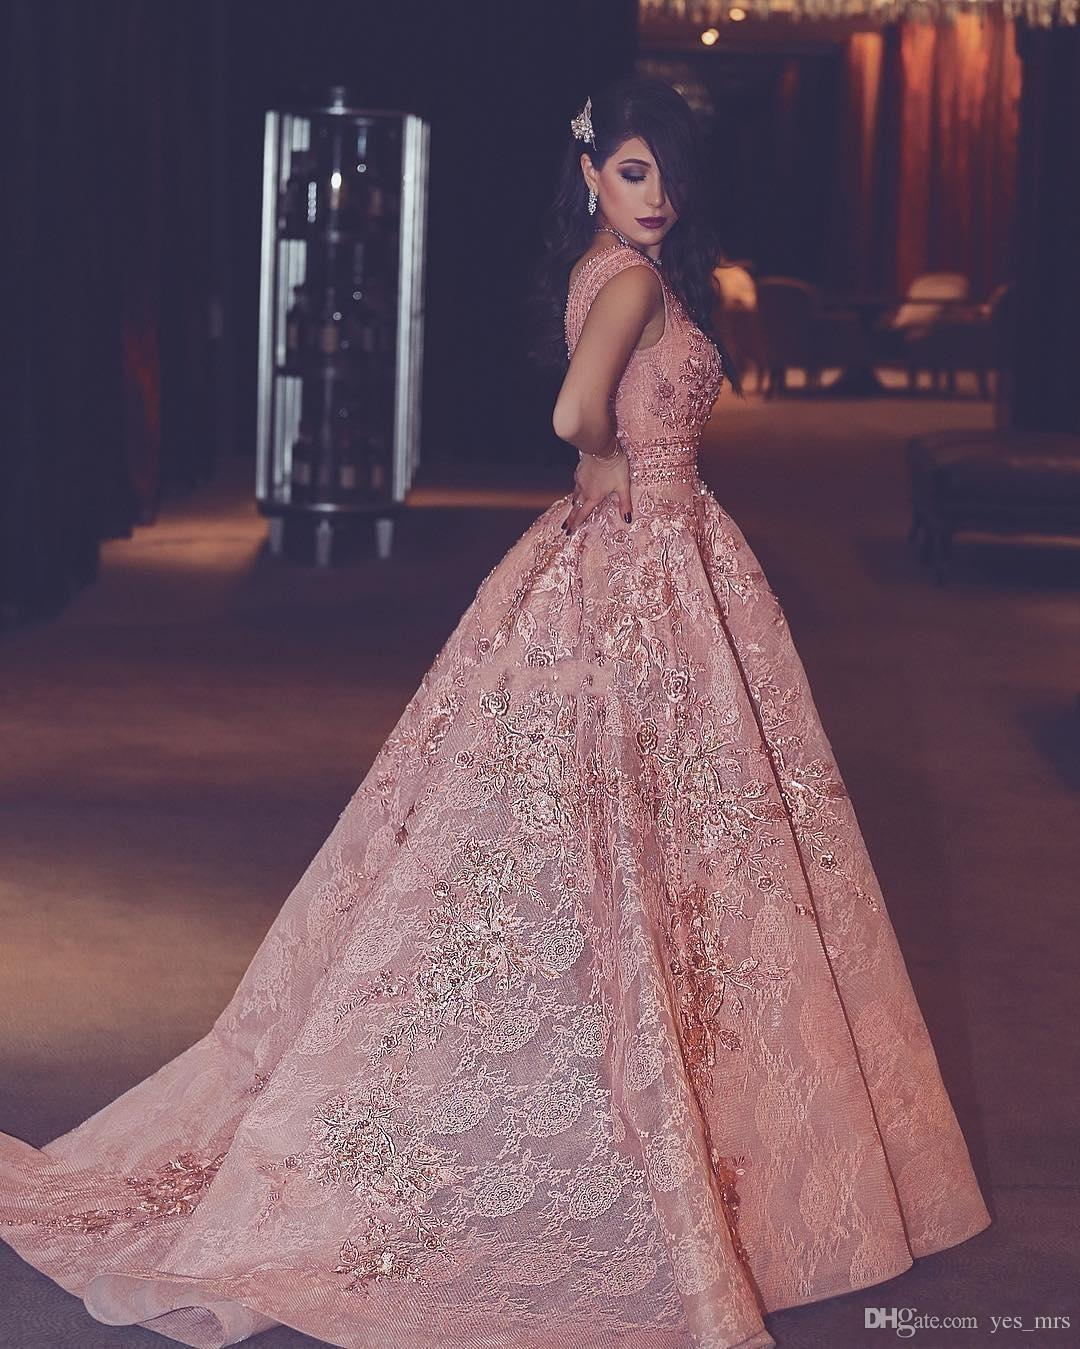 2020 Vestidos Wear V Luxurious Neck mangas completa Lace frisado apliques de cristal Sweep Trem Plus Size Formal vestido de festa Prom Vestidos